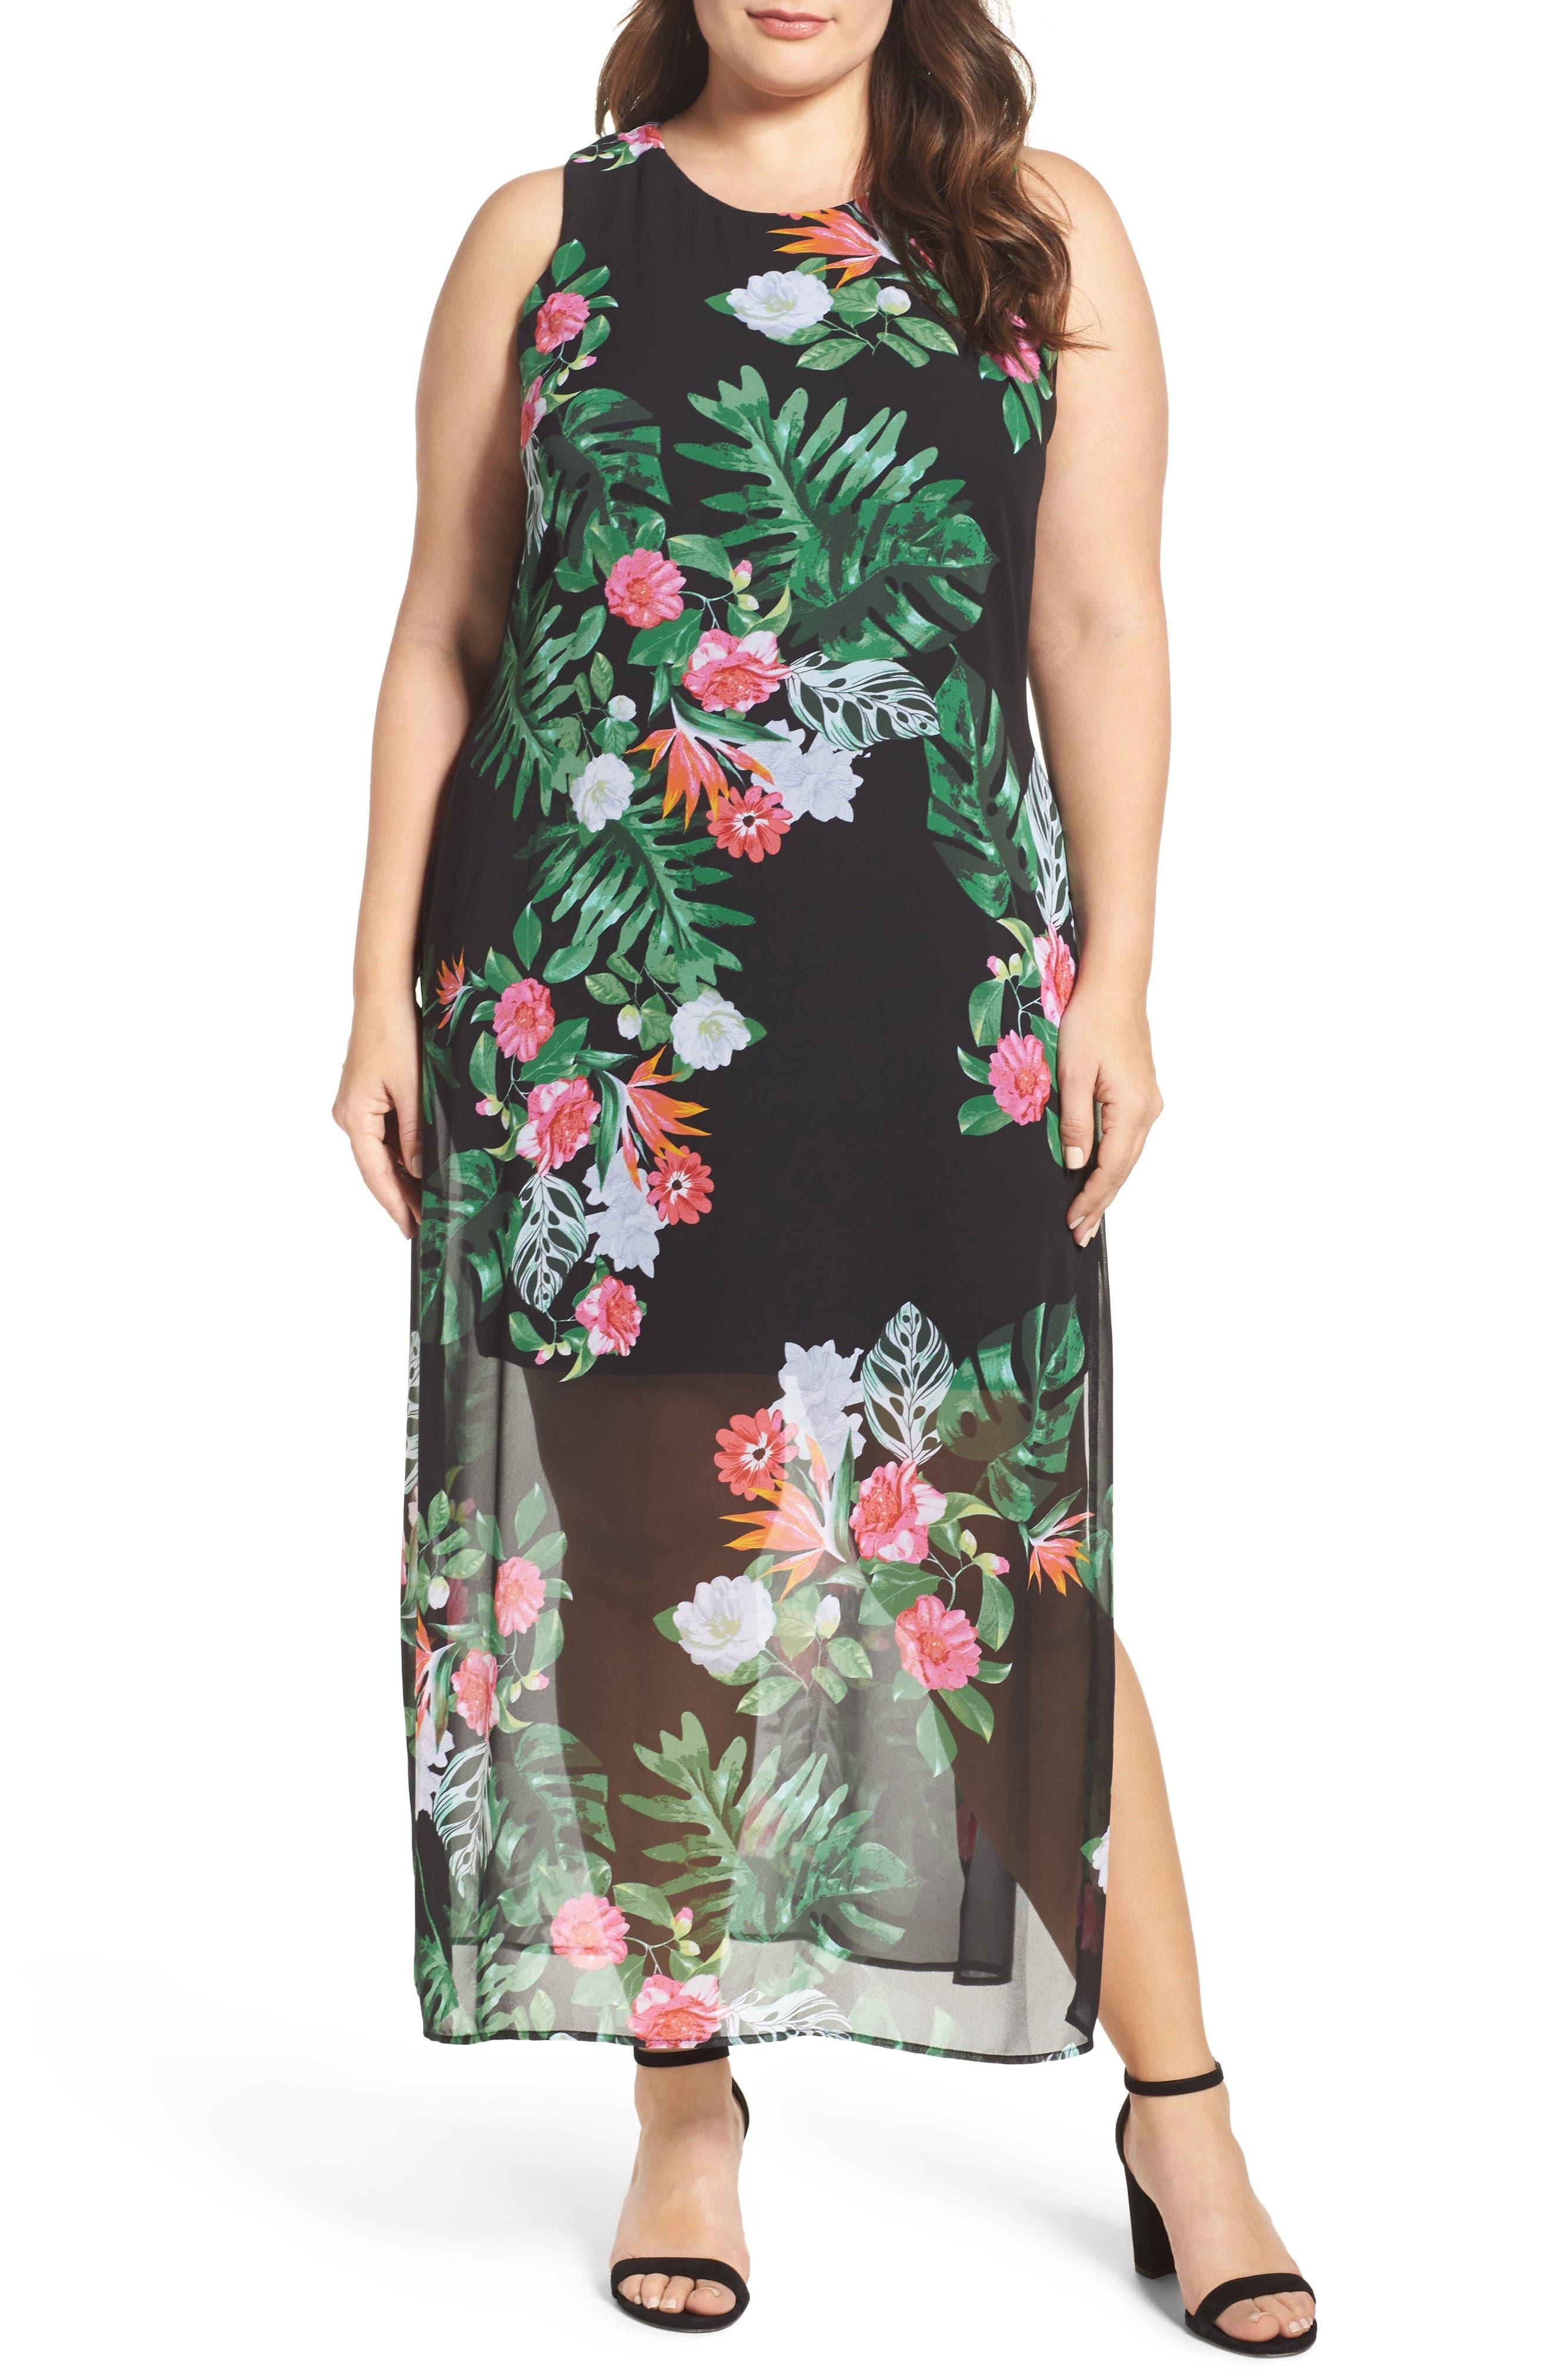 Alternate Image 1 Selected - Vince Camuto Havana Tropical Maxi Dress (Plus Size)